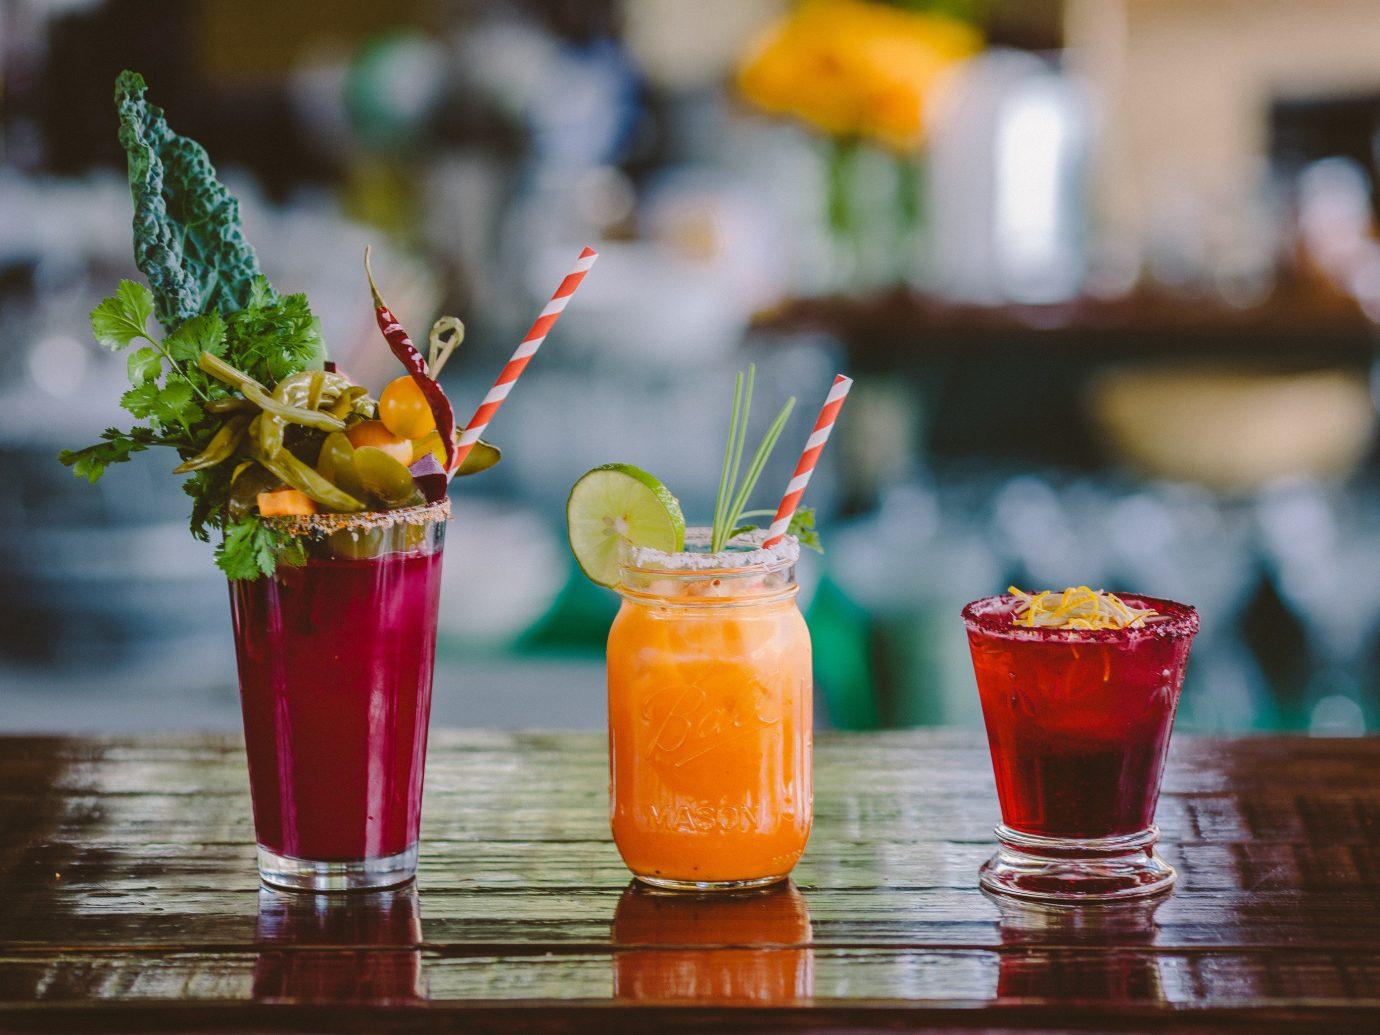 Trip Ideas table cocktail Drink alcoholic beverage glass food orange non alcoholic beverage mai tai produce singapore sling distilled beverage beverage